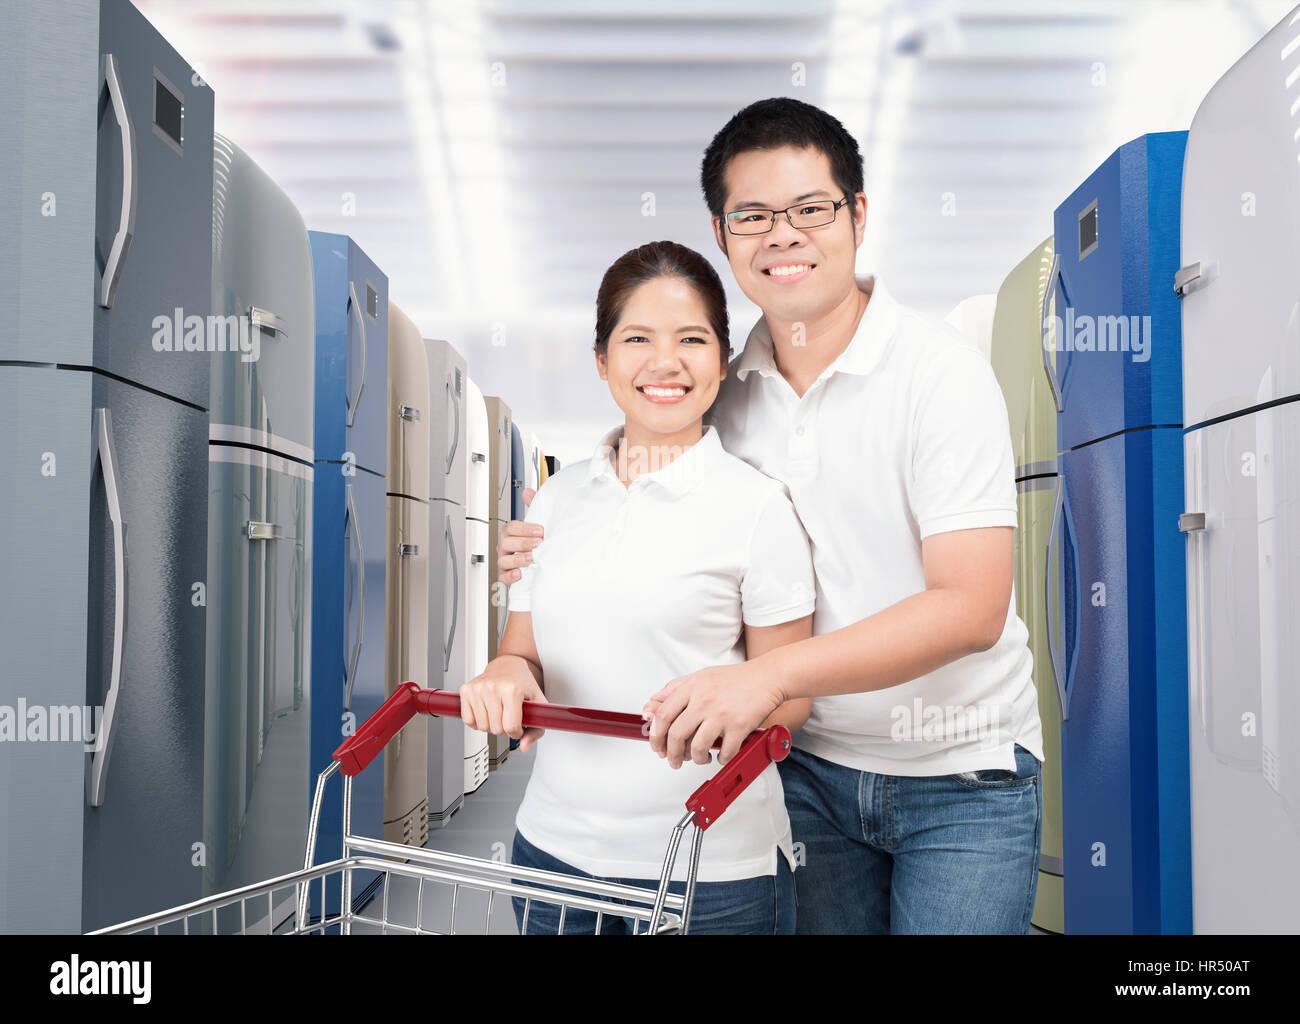 Couple Shopping Kitchen Appliances Stock Photos & Couple Shopping ...